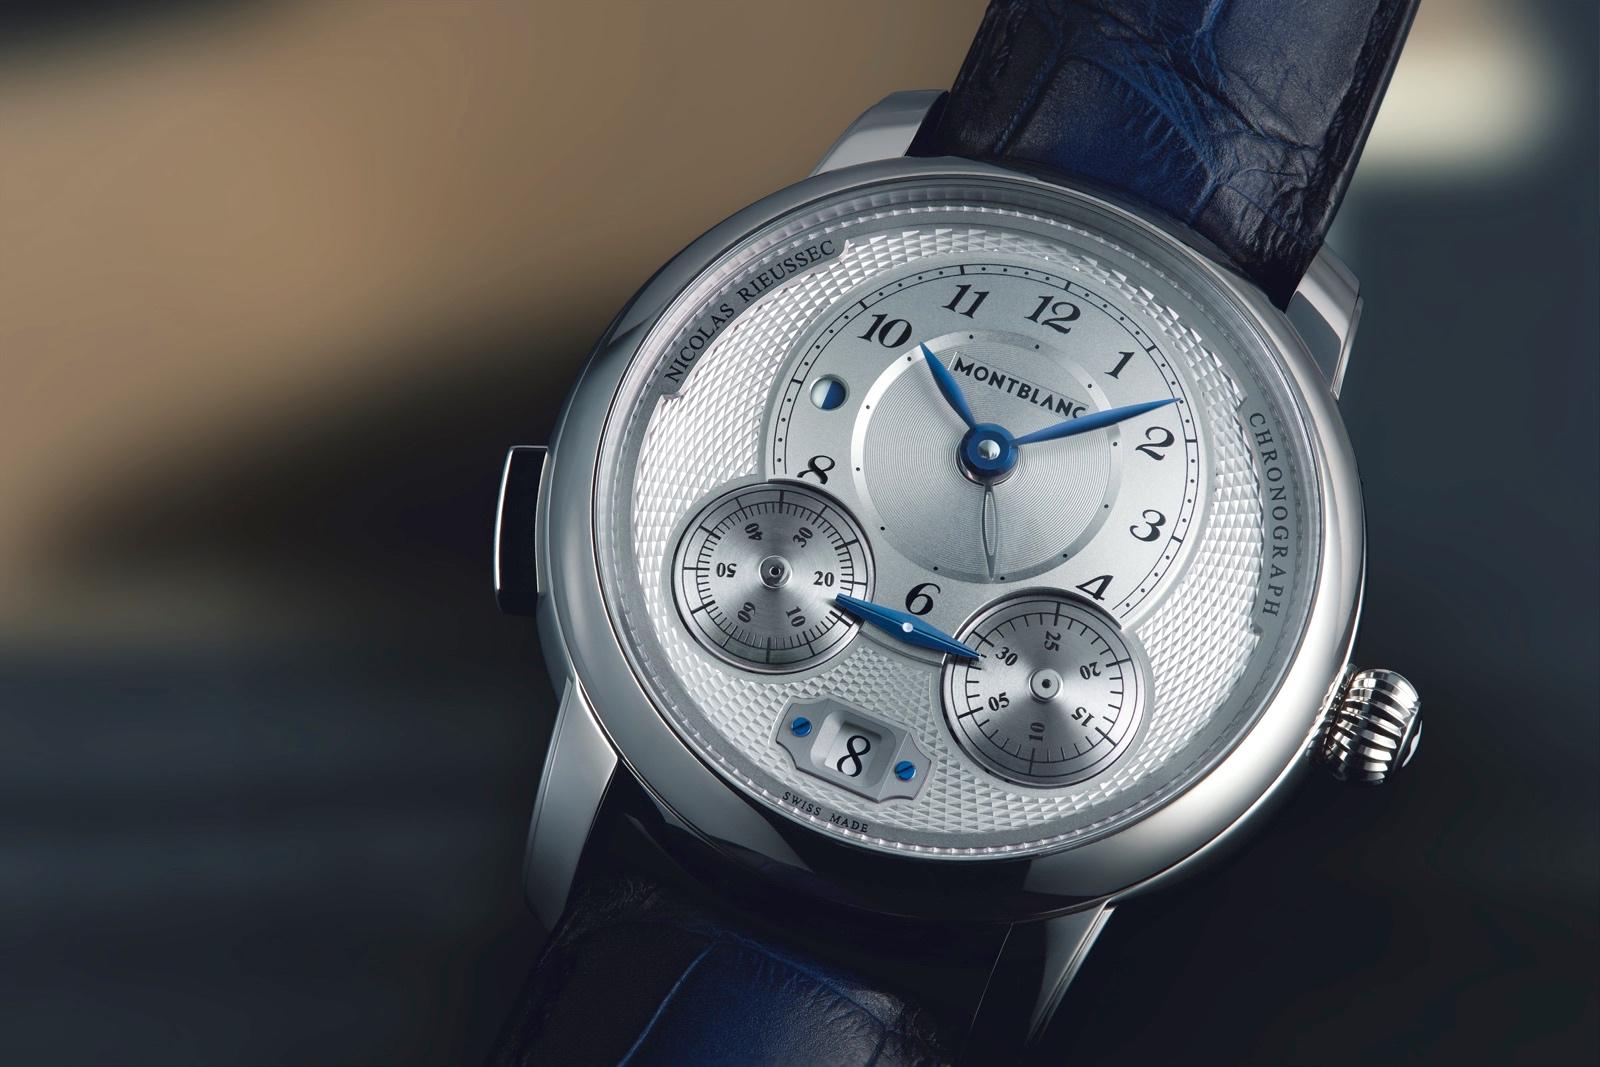 Montblanc Nicolas Rieussec Chronograph 2018 Detalle